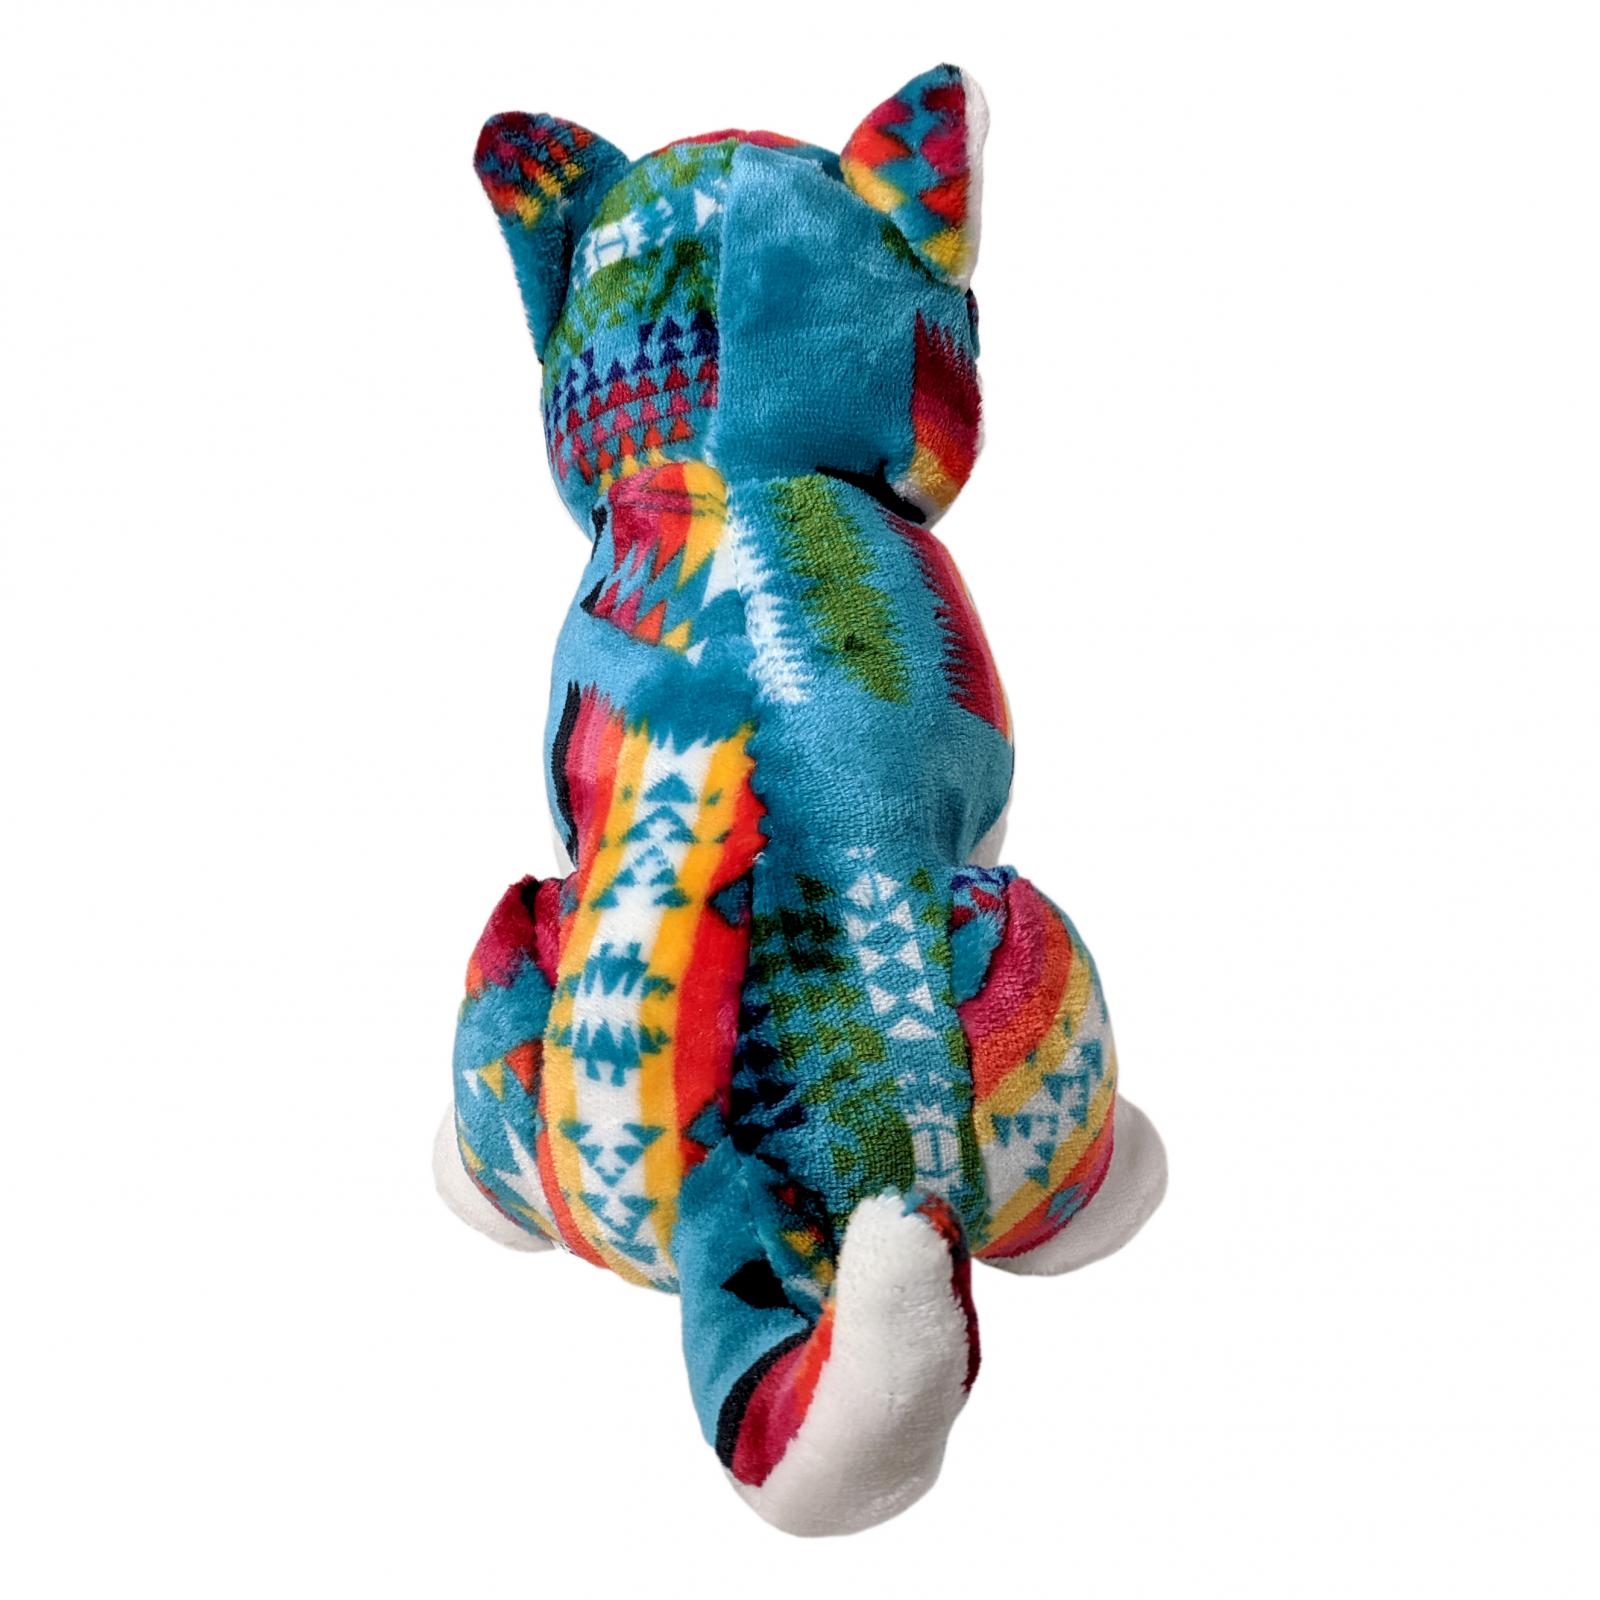 TychoTyke Stuffed Animal Husky Plush Toy Southwest Teal